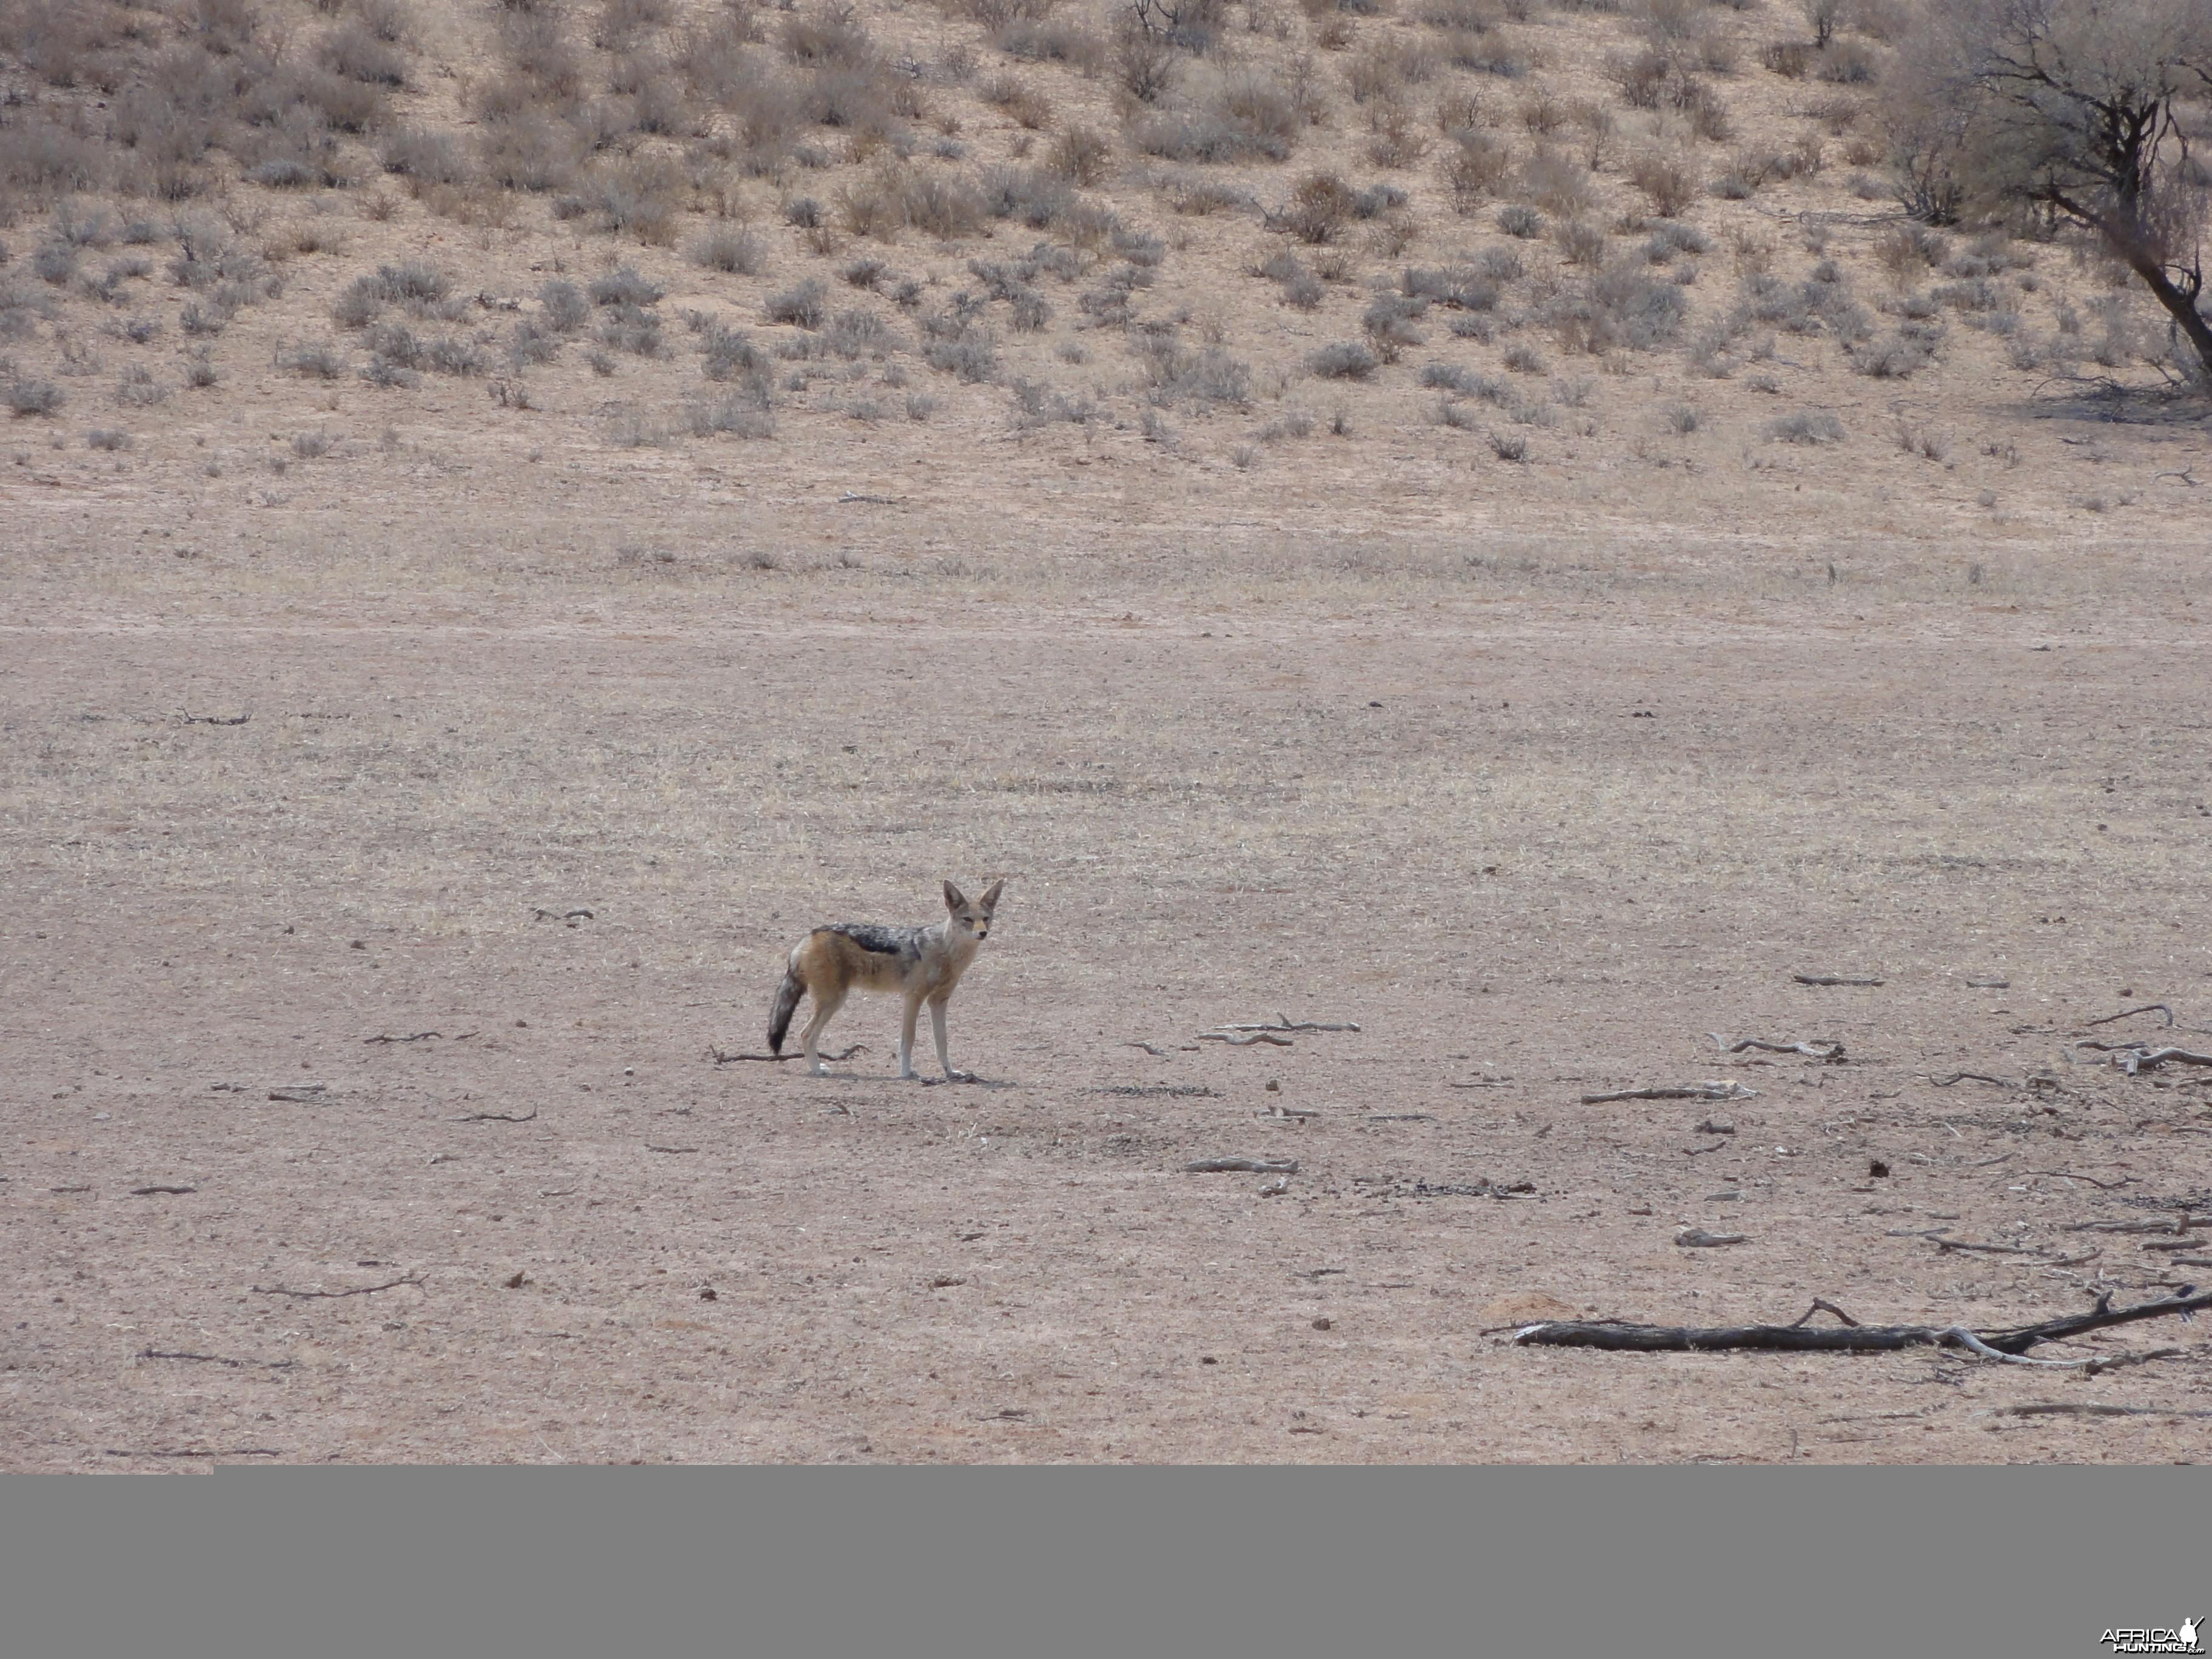 Jackal Namibia